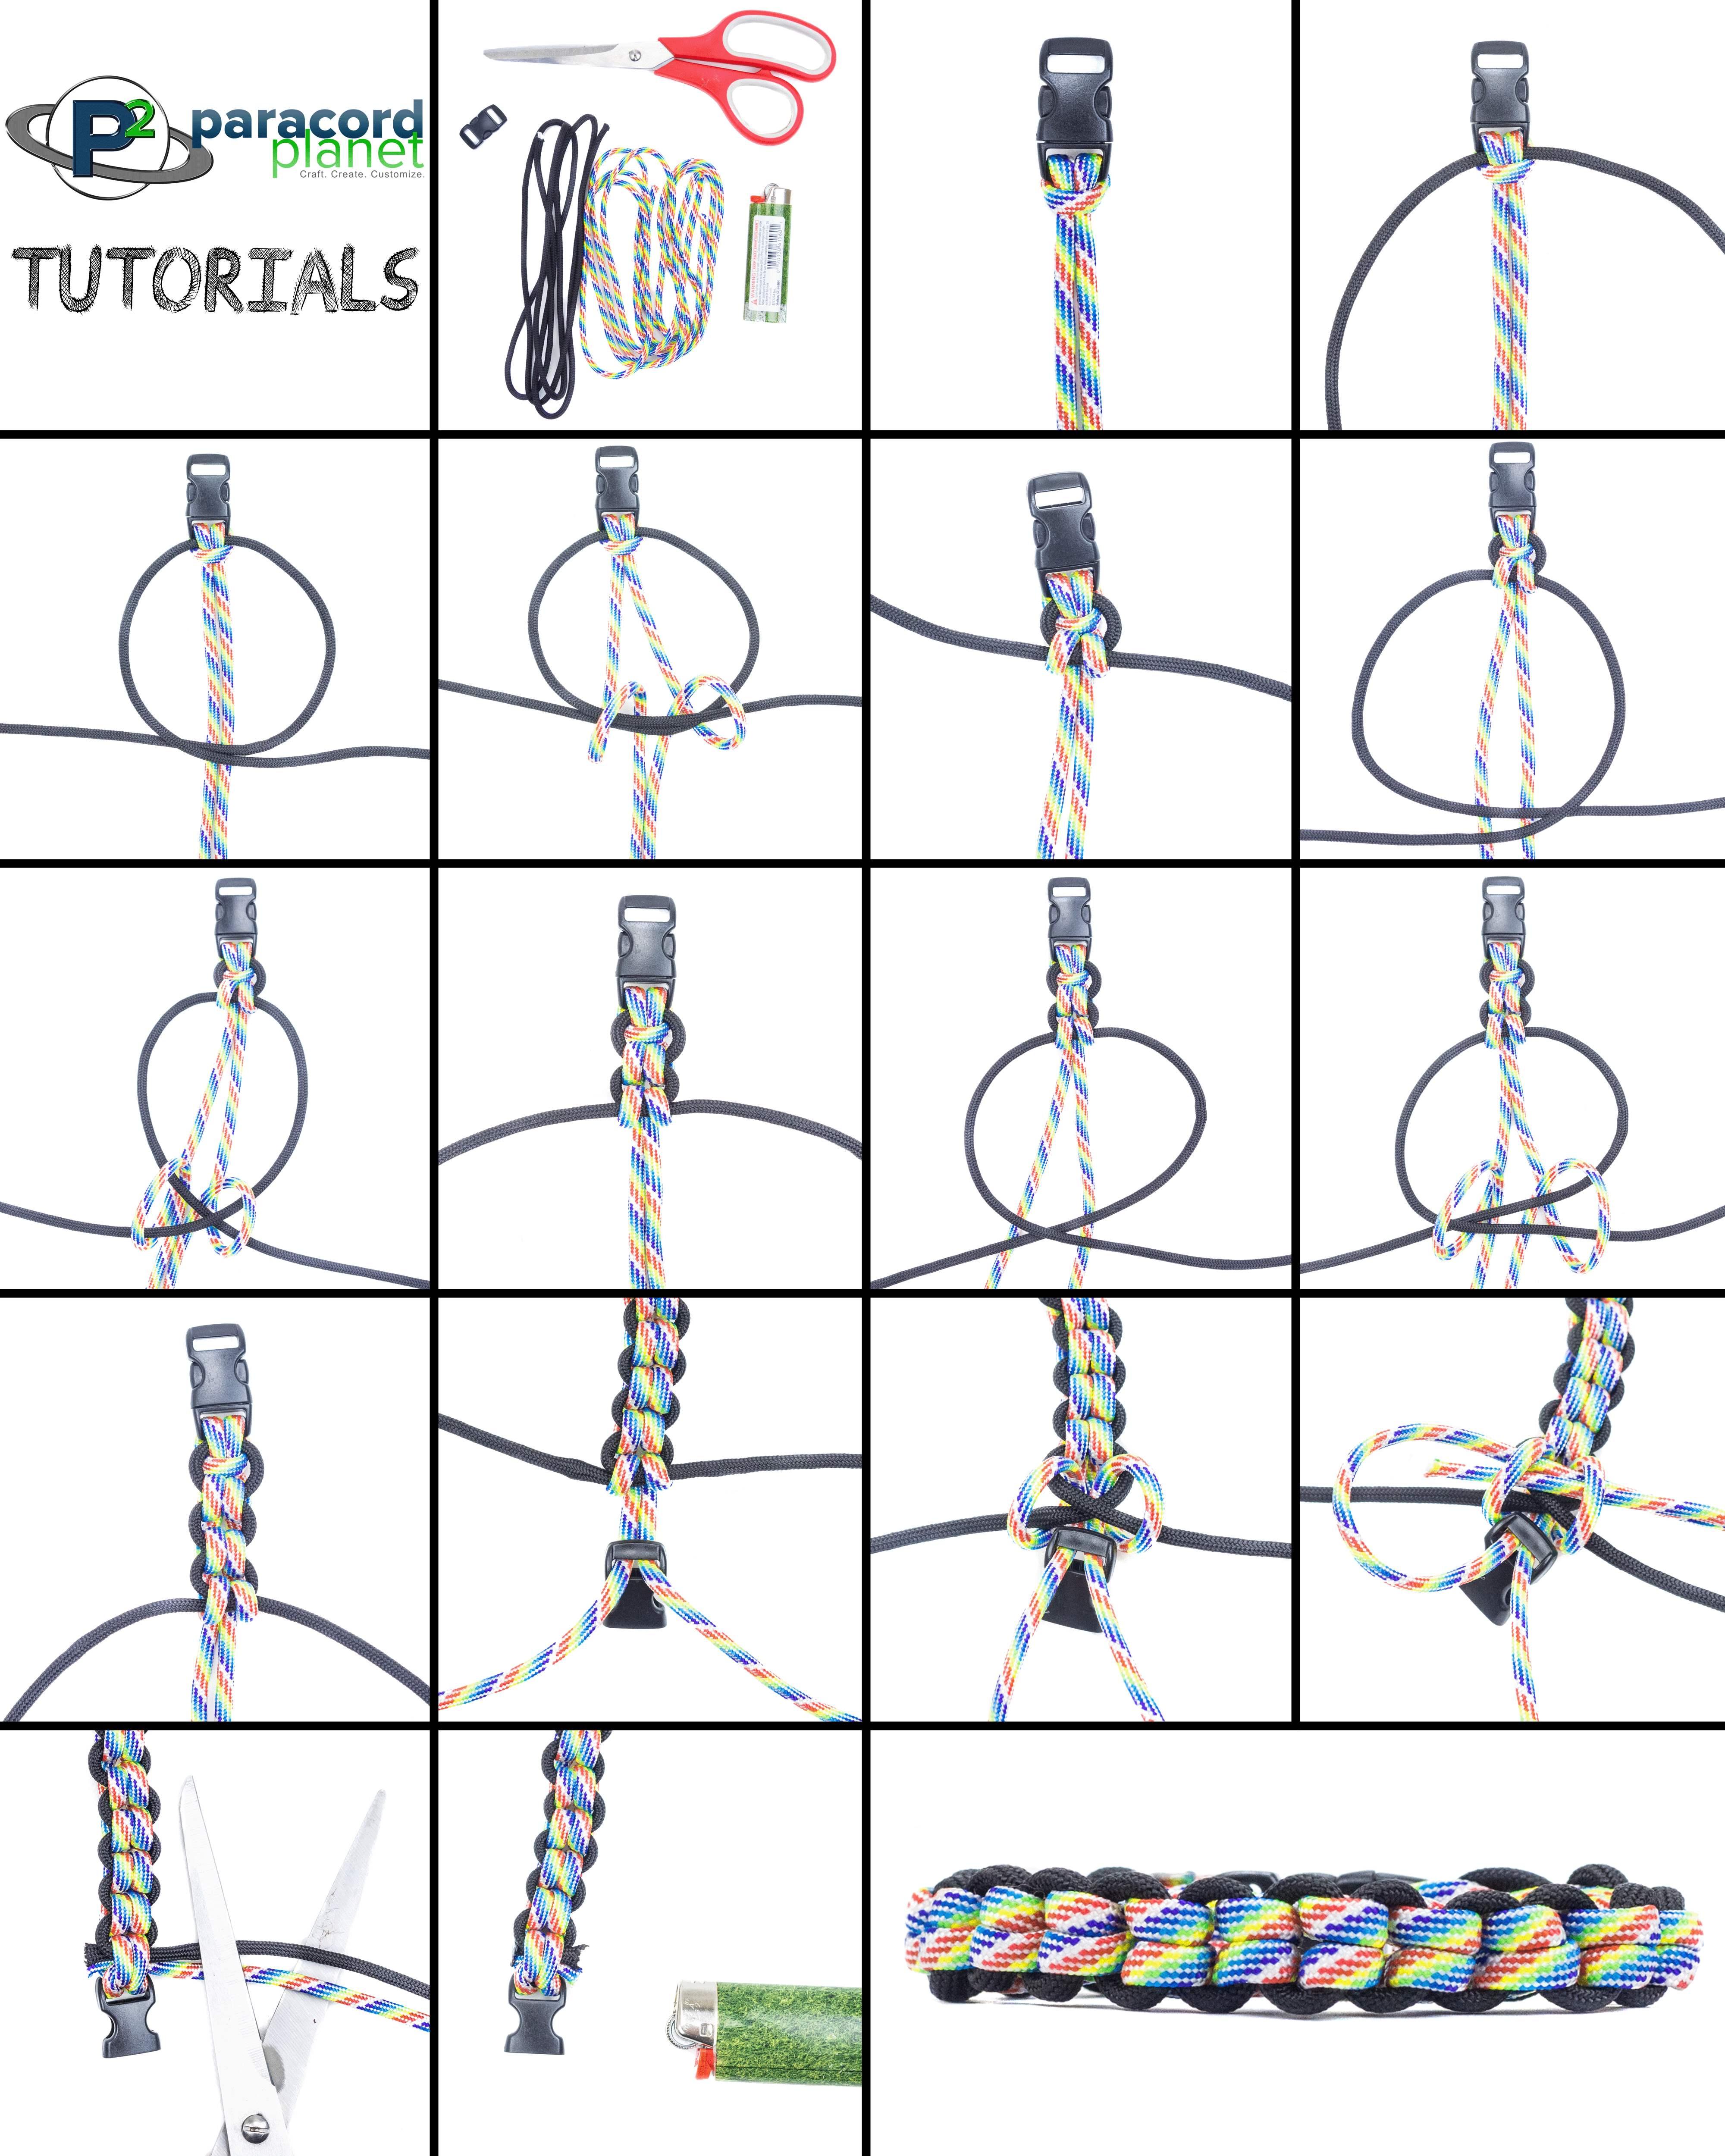 Endless Fall paracord bracelet picture tutorial